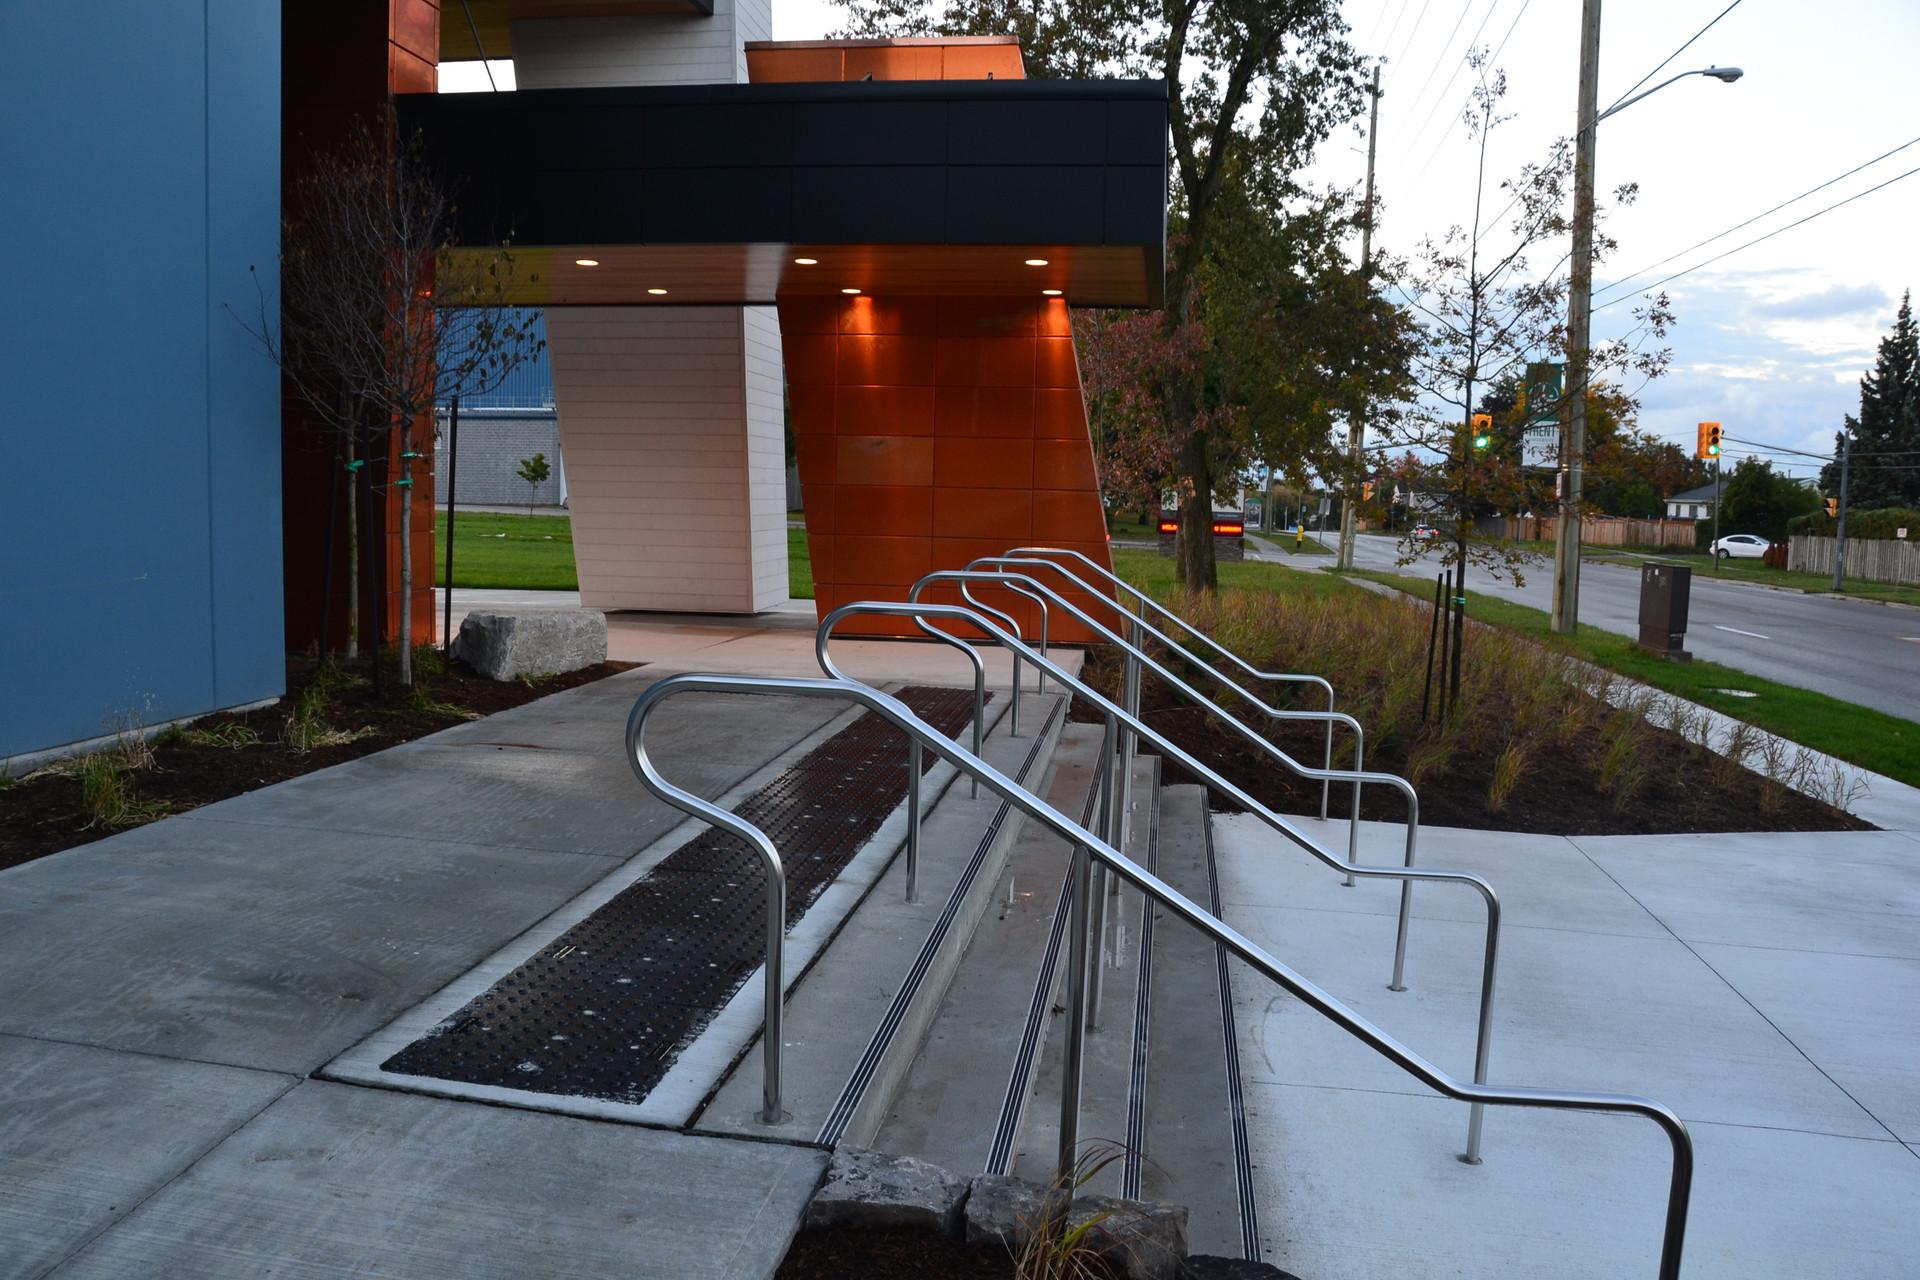 Trent U Oshawa - Street Entrance